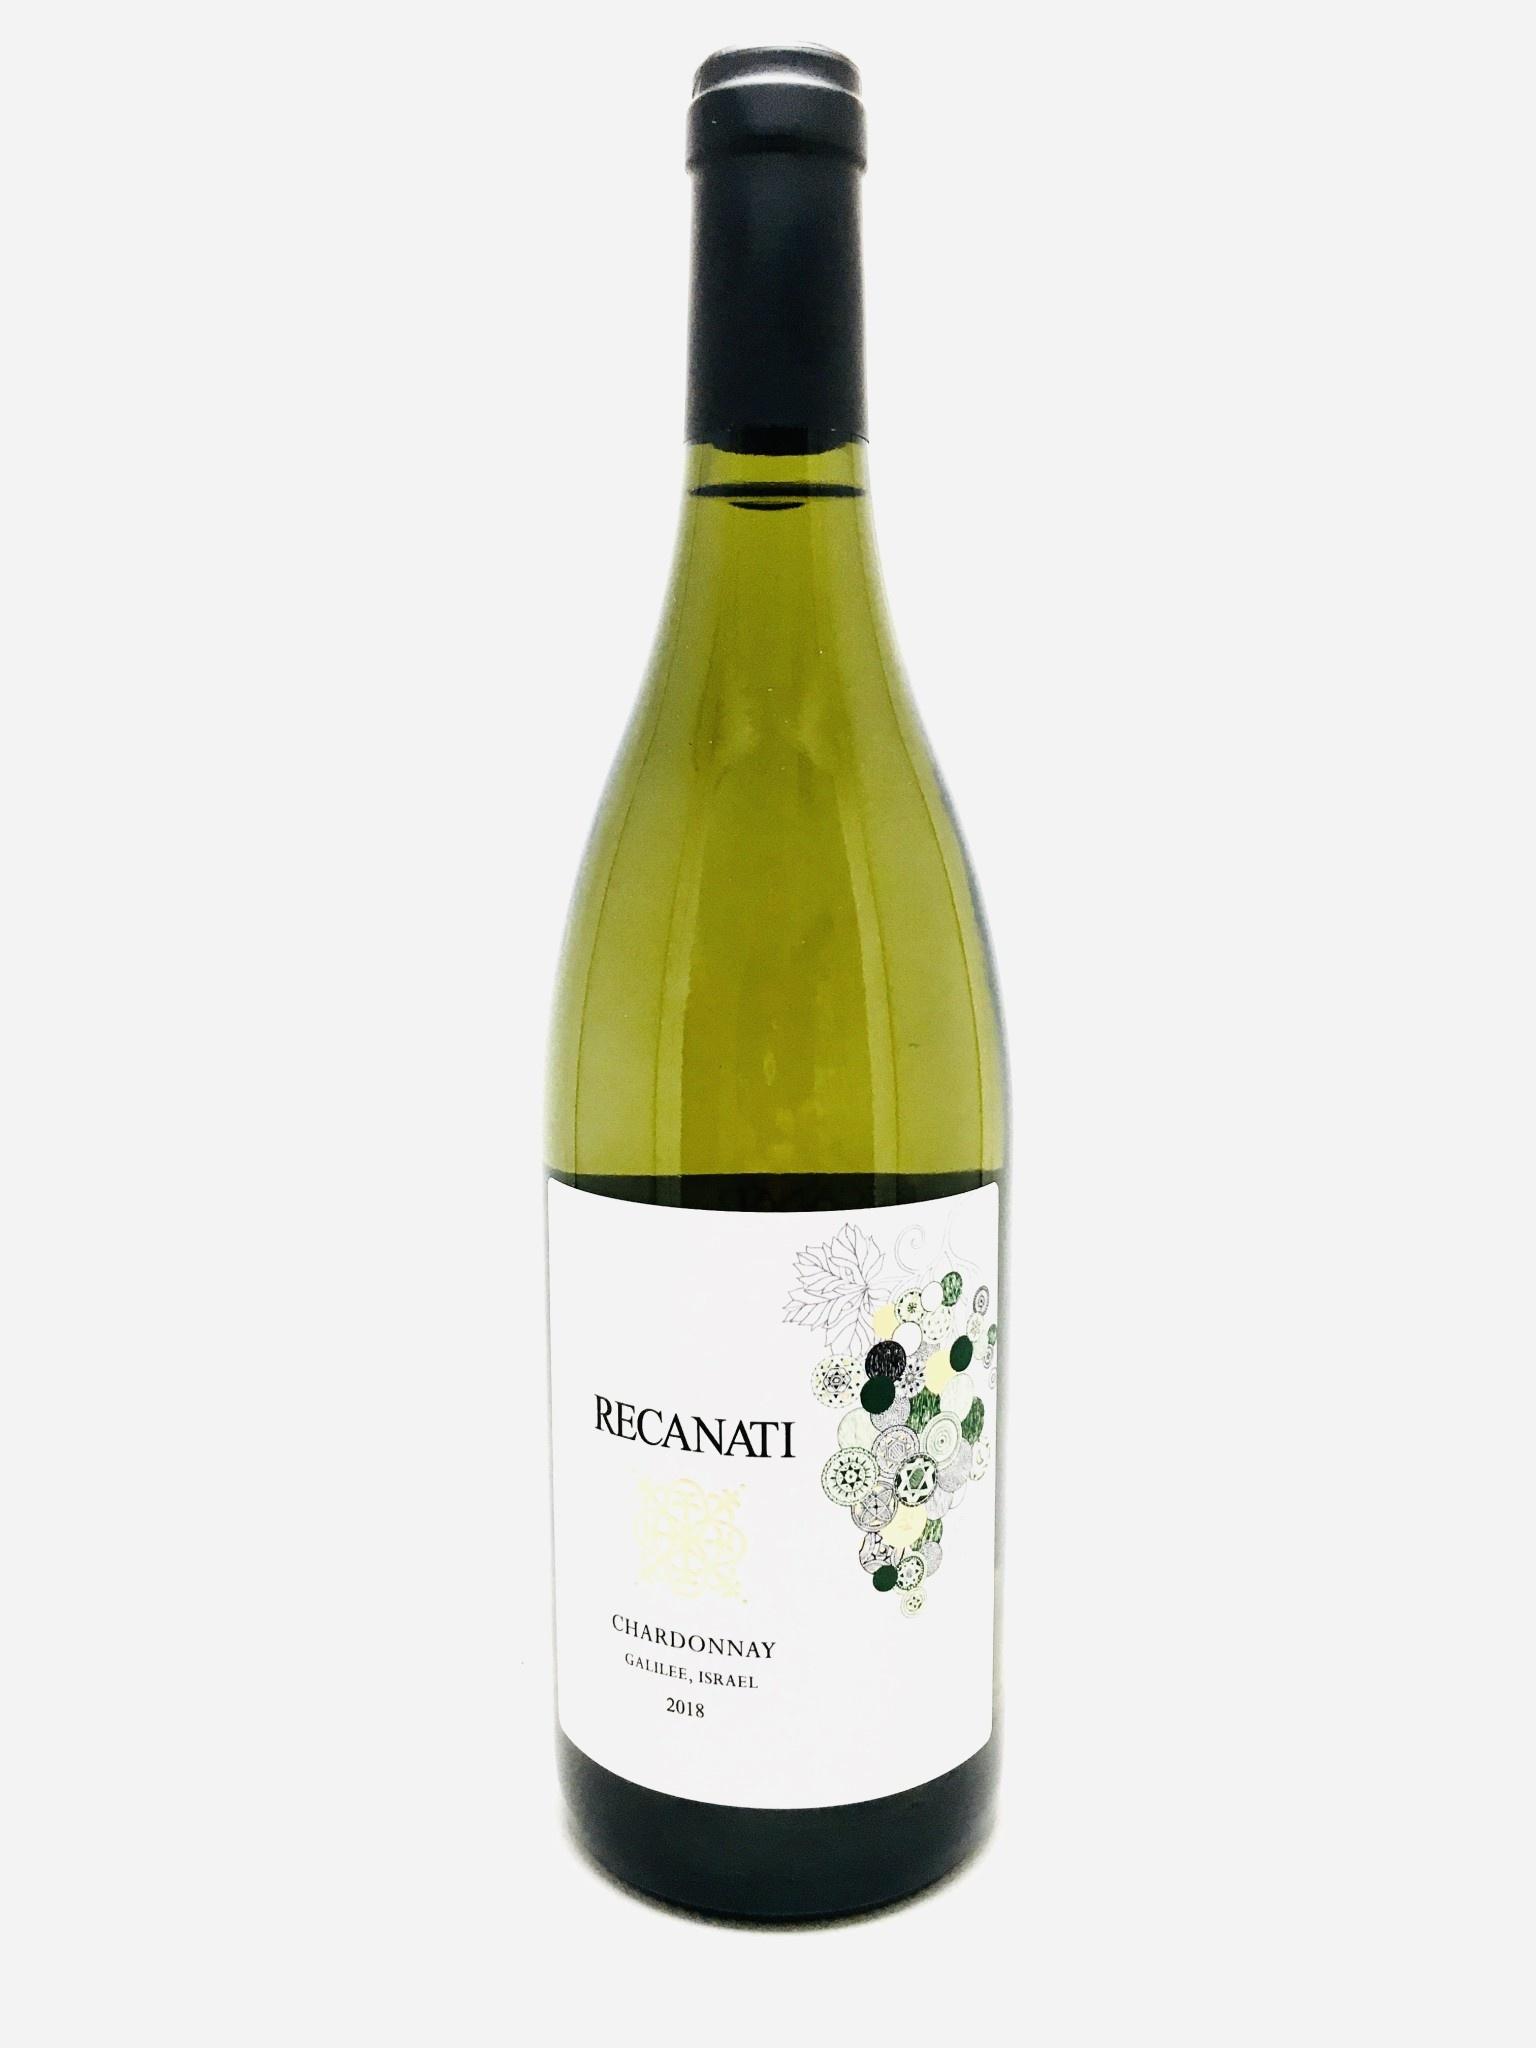 Recanati Chardonnay Galilee Israel 2018